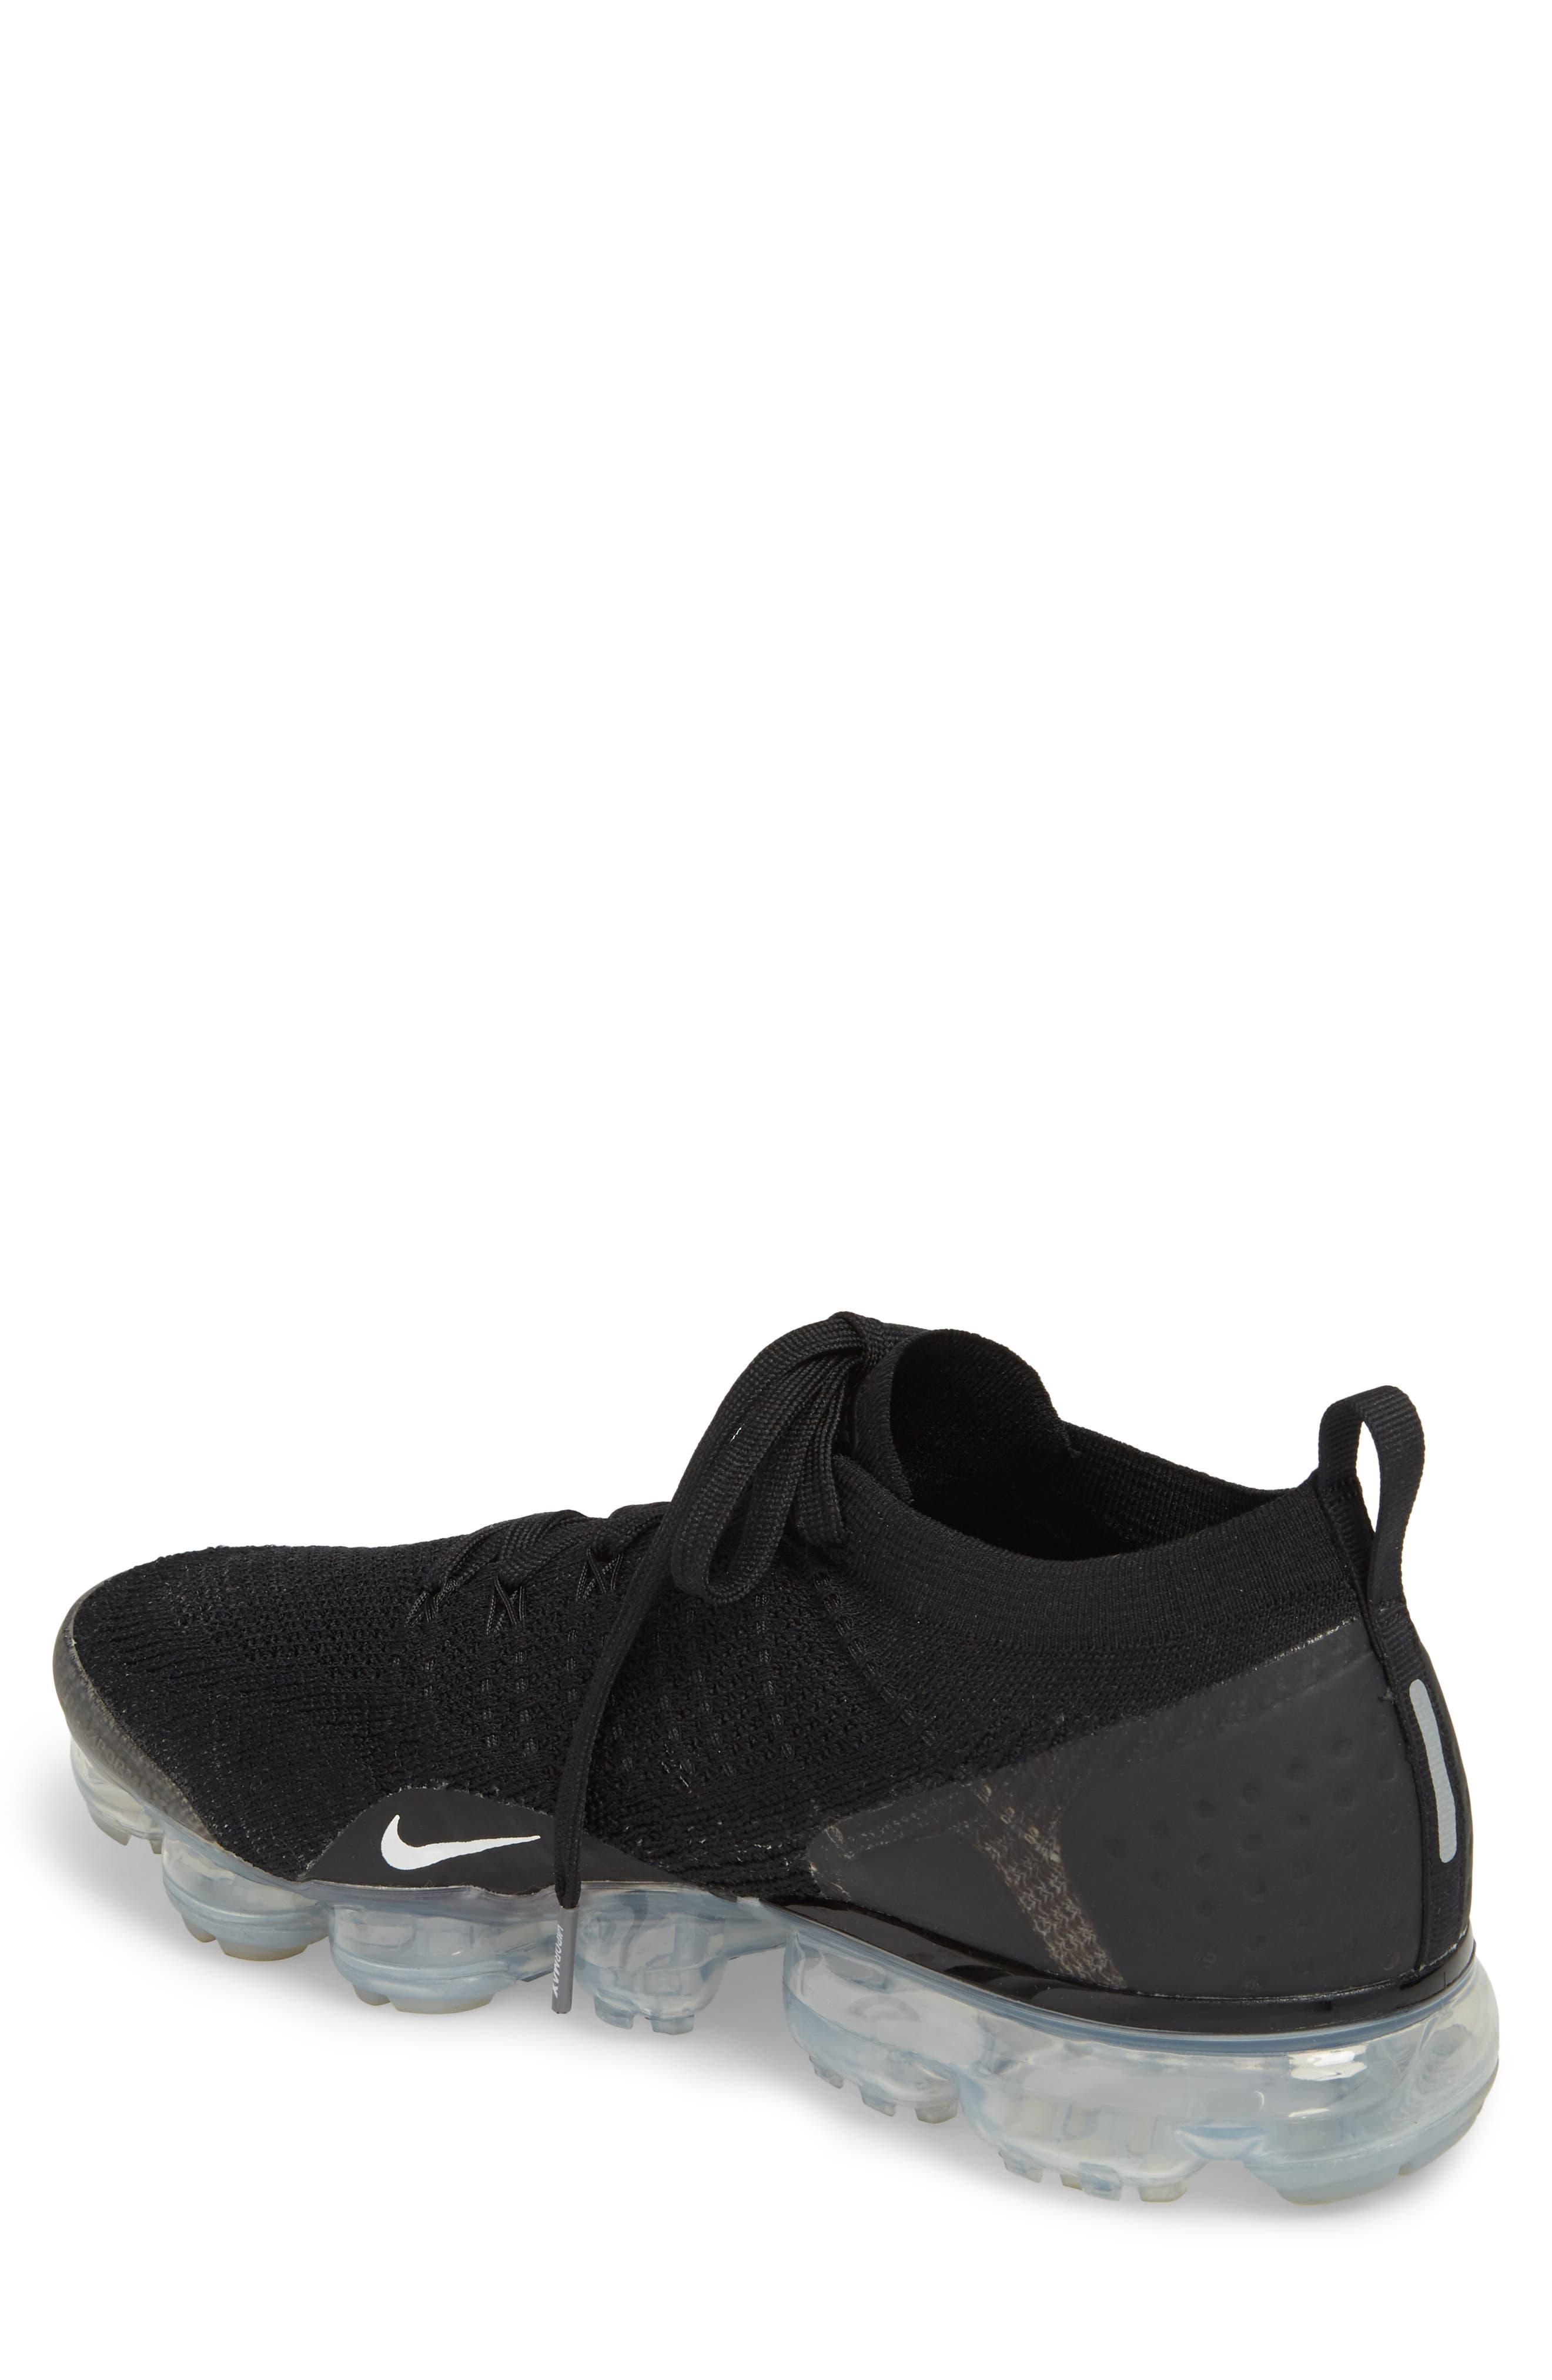 Air Vapormax Flyknit 2 Running Shoe,                             Alternate thumbnail 2, color,                             Black/ White/ Dark Grey